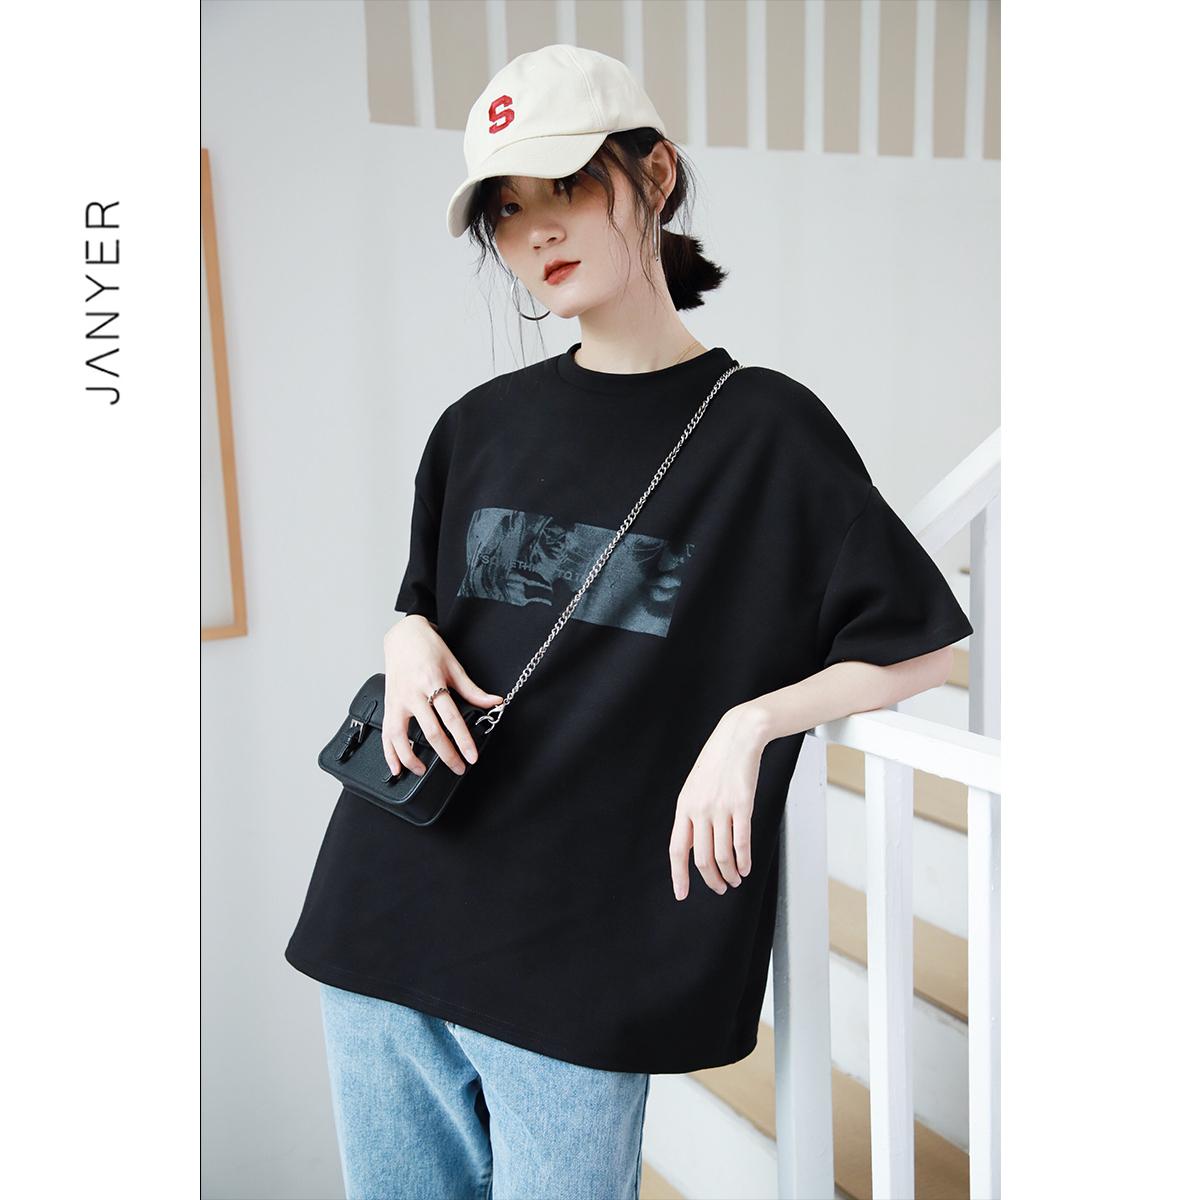 Short-sleeved t-shirt female black 2021 summer new loose body 桖 Korean version of cotton INS tidal 风 半 半 半 上